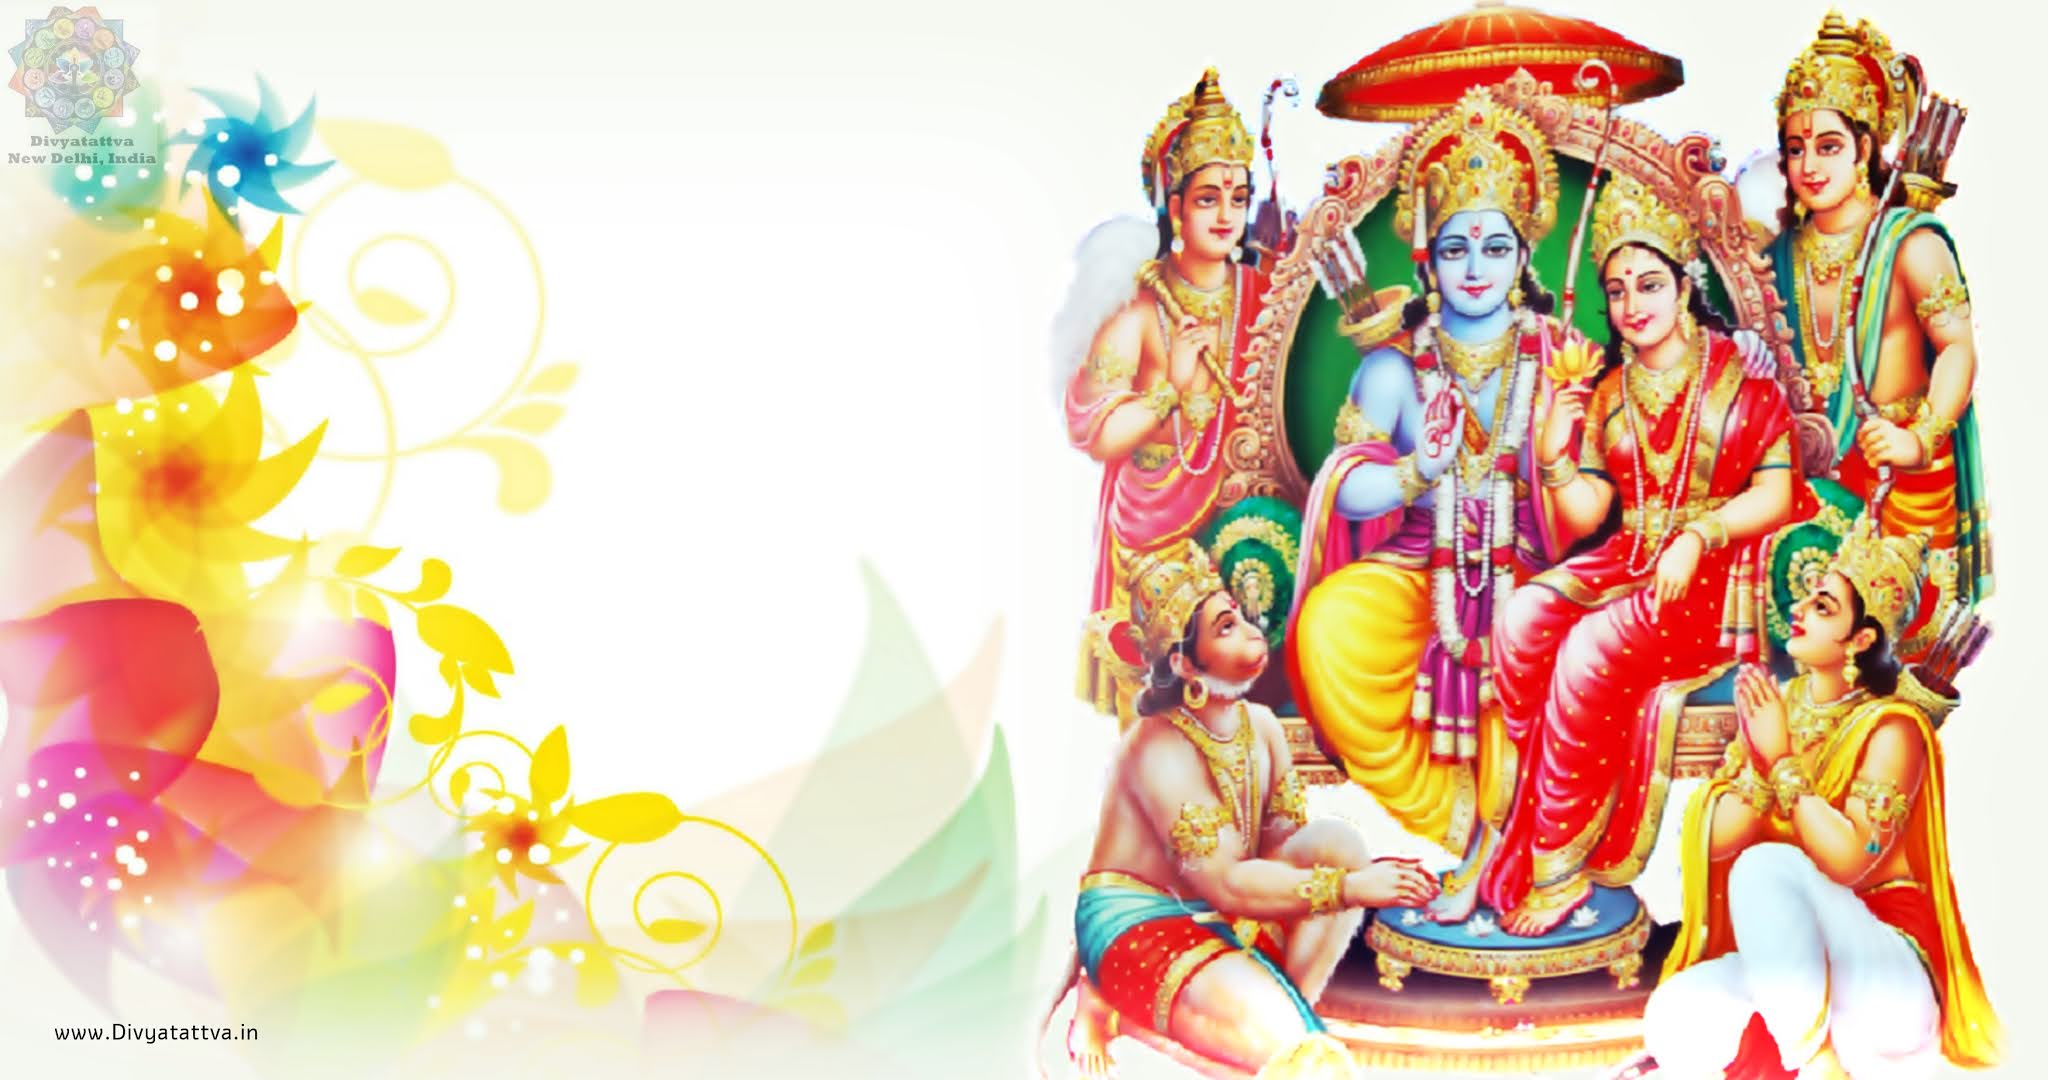 Photo Gallery and Pictures of Lord Rama, Sita, Hanuman, Laxman or Rama Parivar Wallpapers